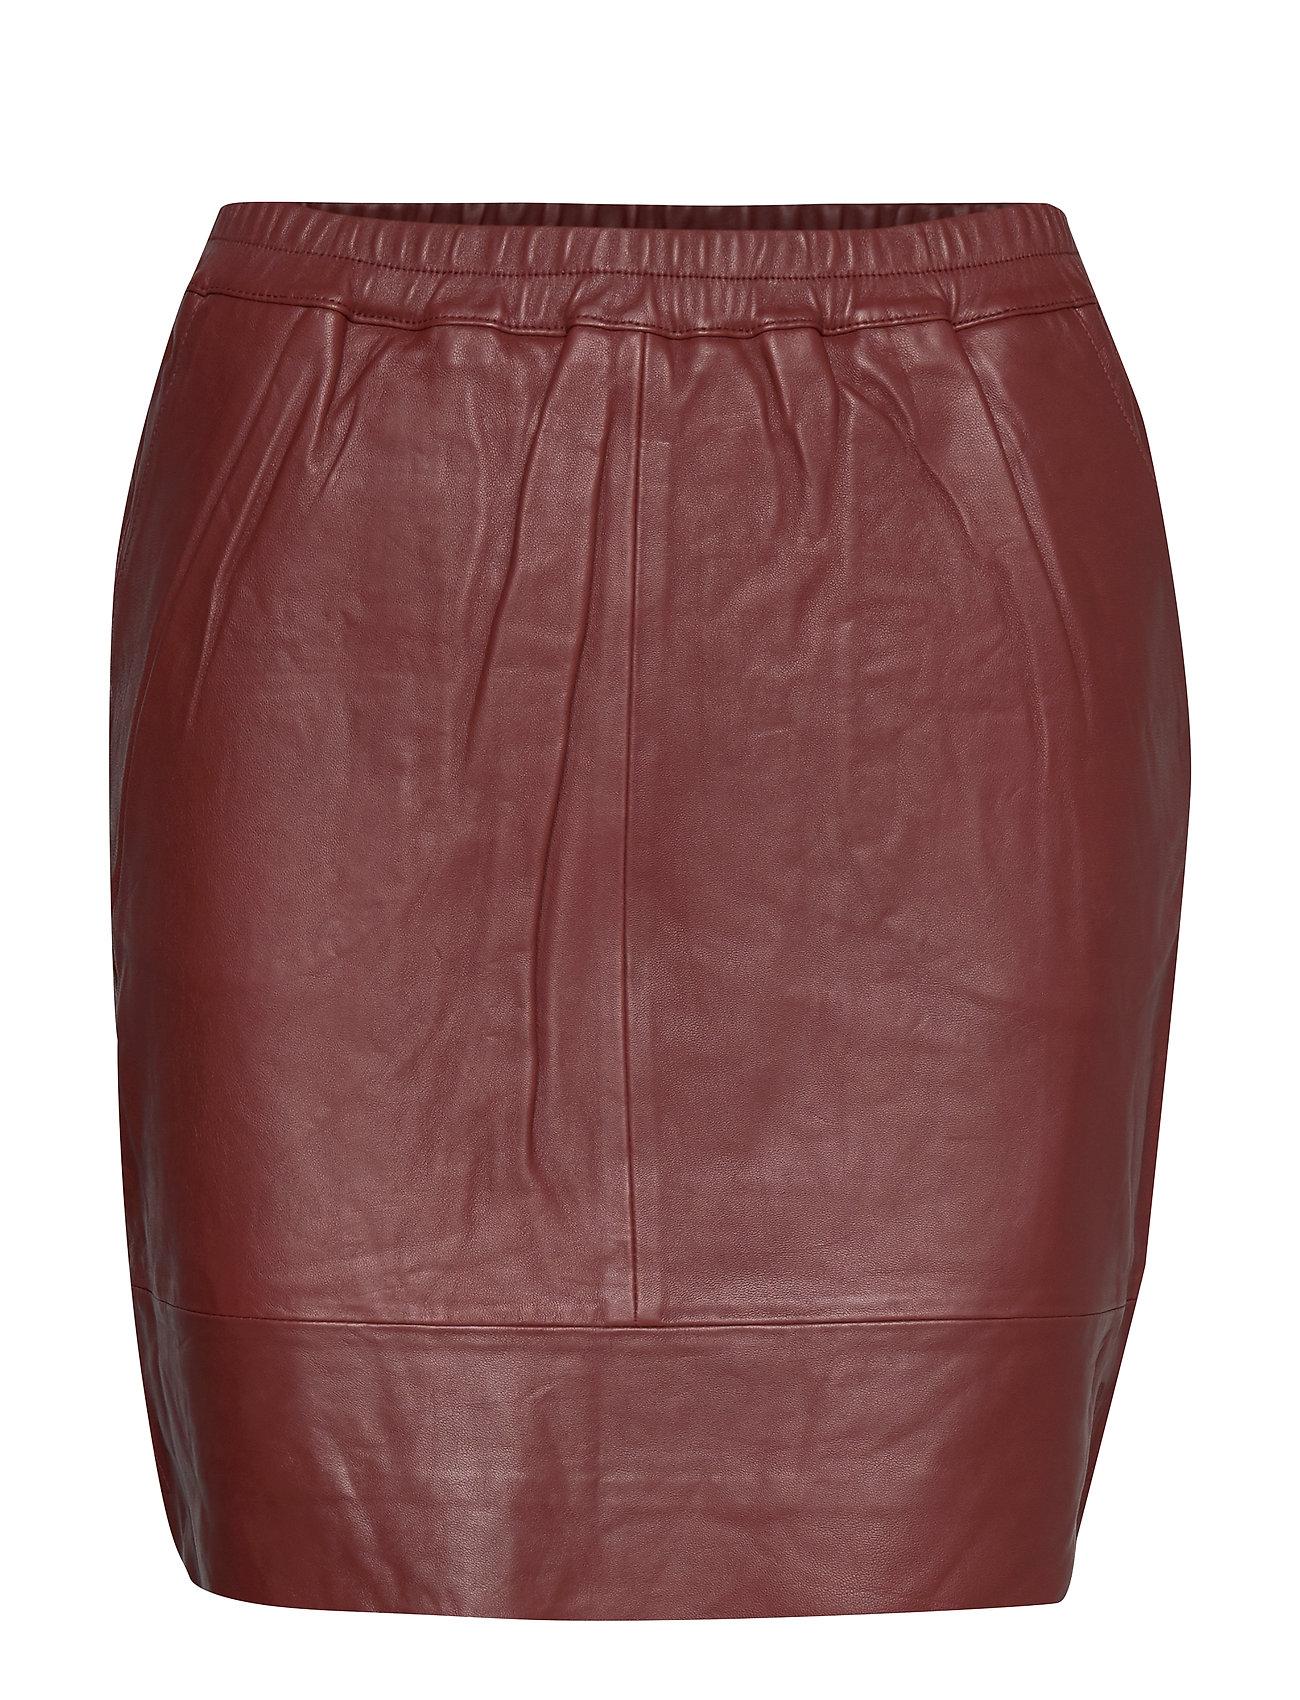 Coster Copenhagen Leather skirt w. elastic in waist - BURNT HENNA